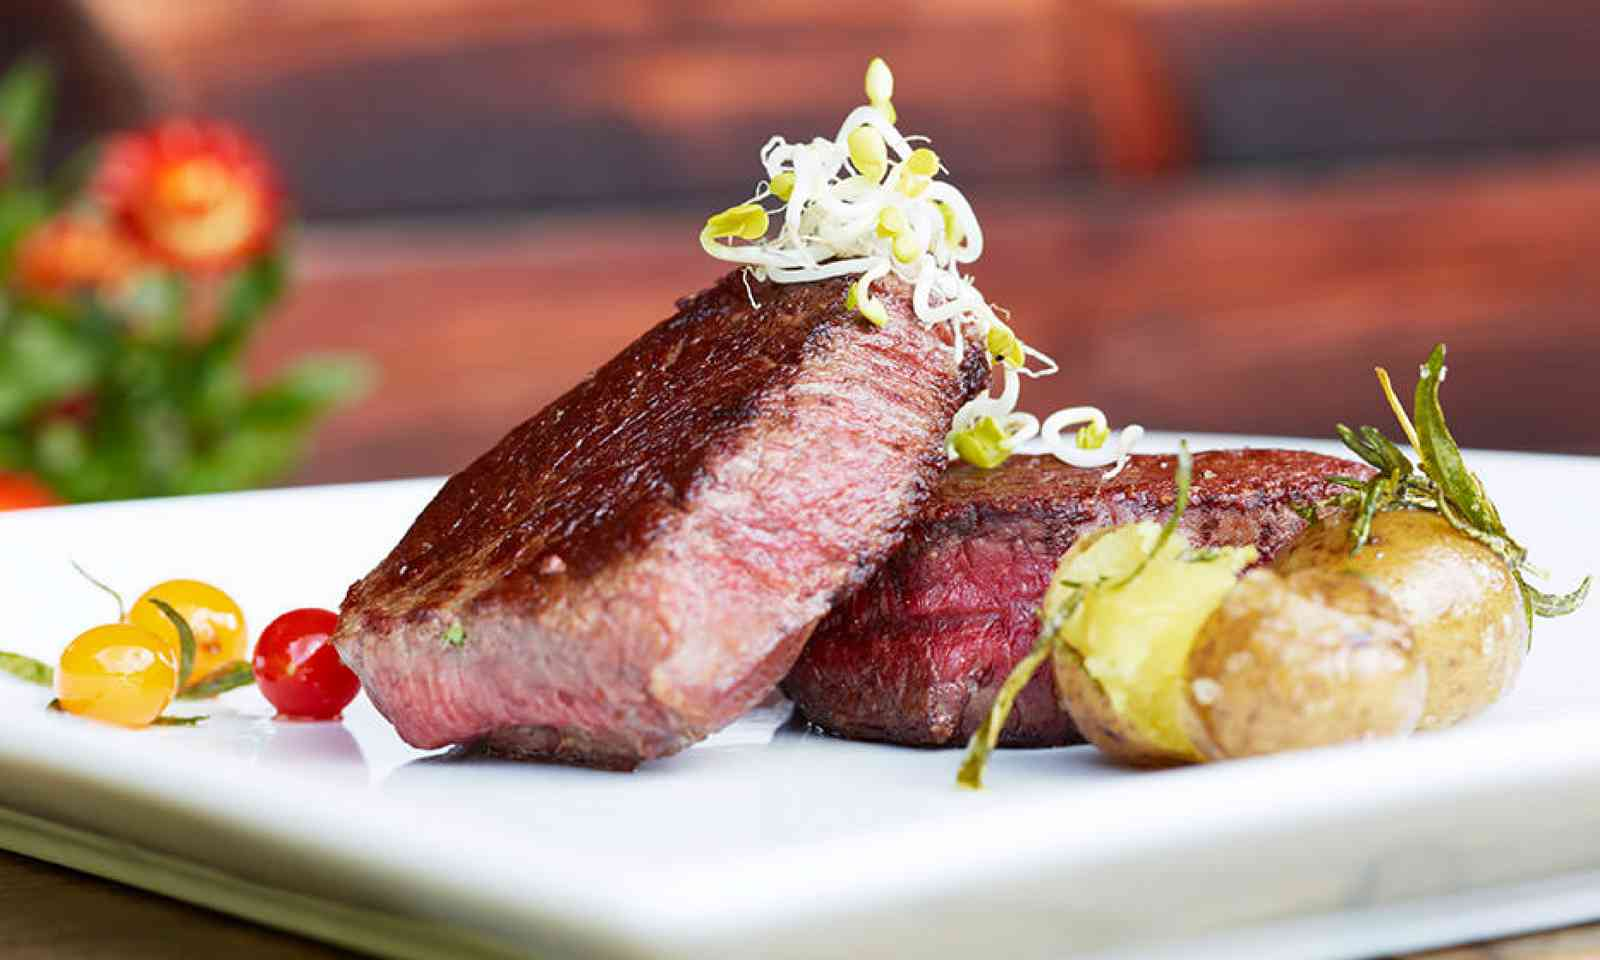 Steak at Steak Alm restaurant (kirchleitn.com)